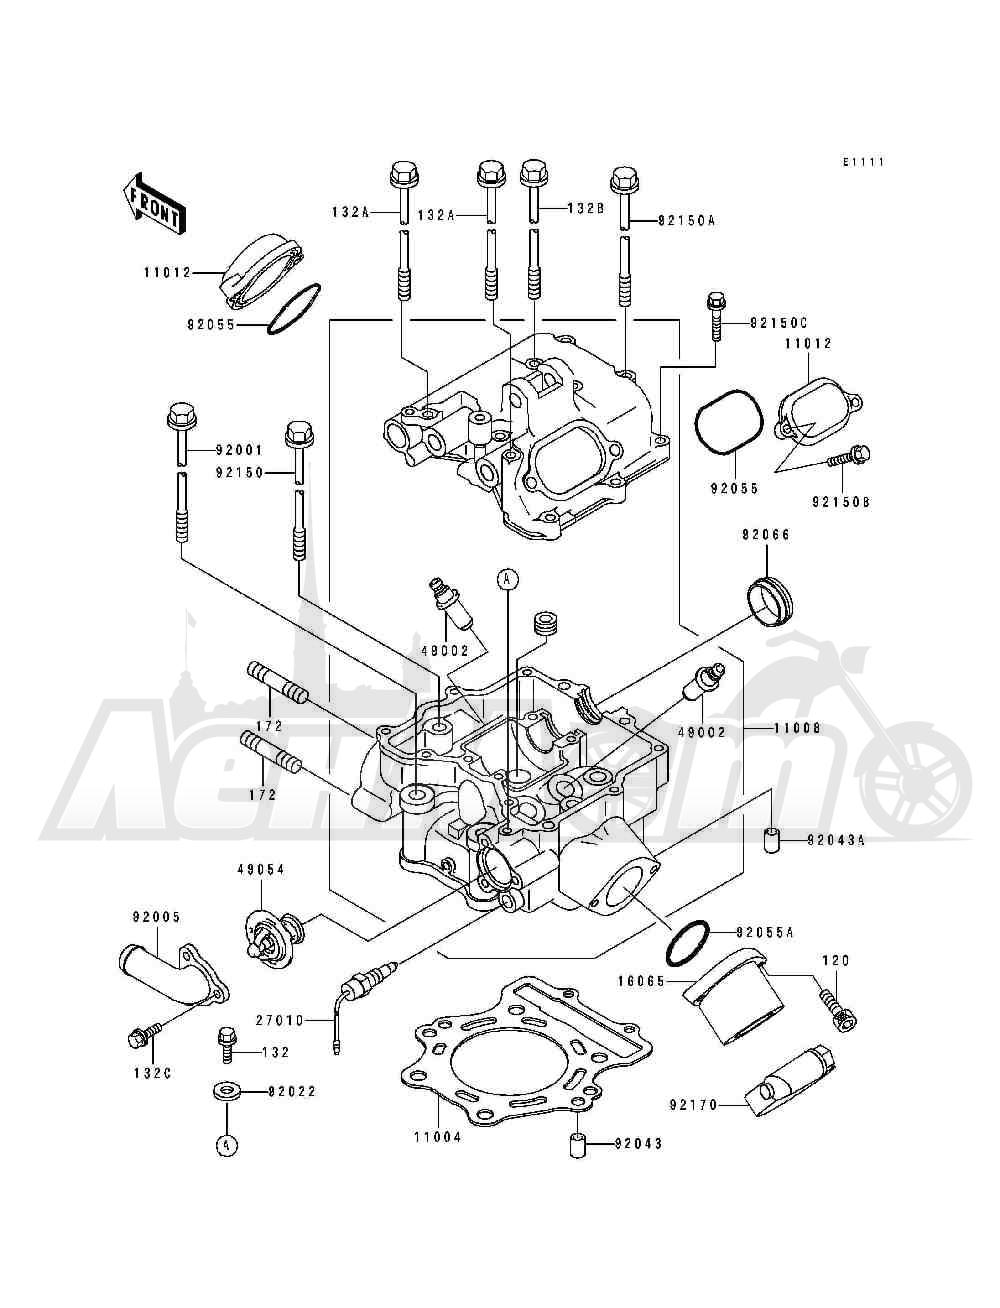 Запчасти для Квадроцикла Kawasaki 1994 BAYOU 400 4X4 (KLF400-B2) Раздел: CYLINDER HEAD | головка цилиндра